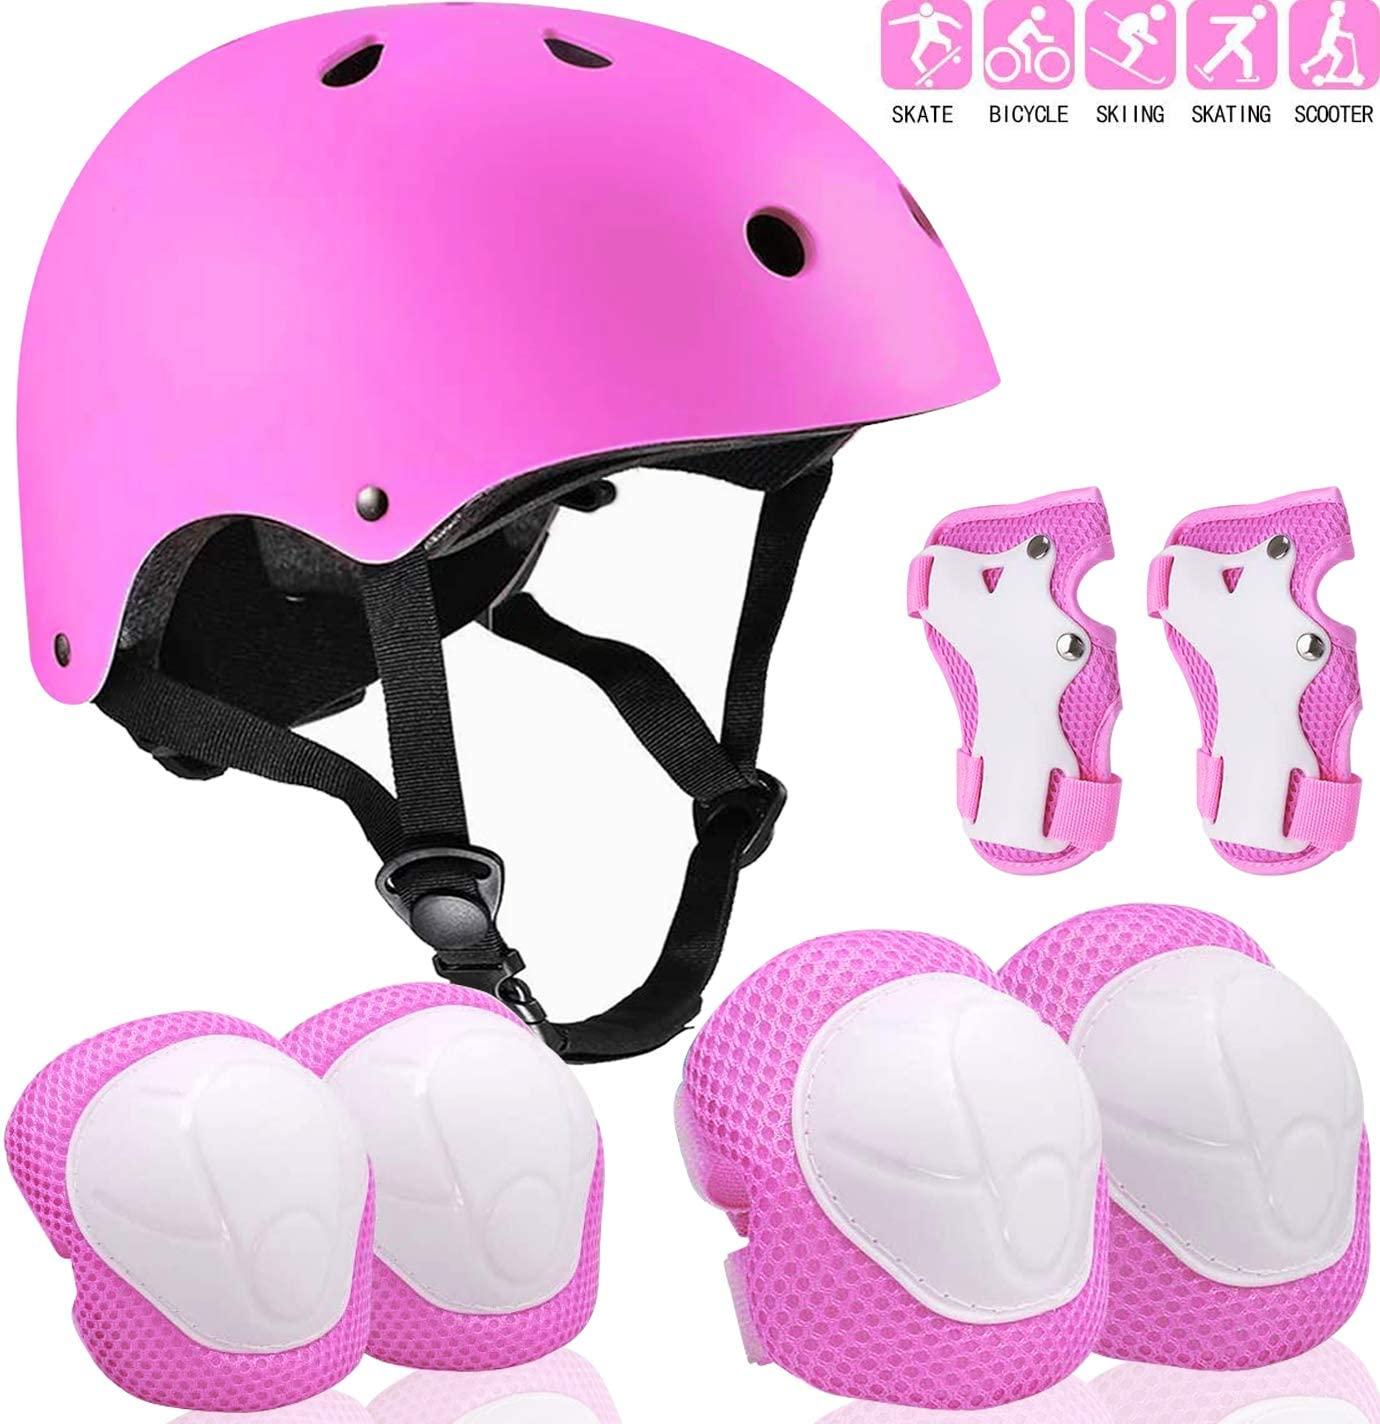 ZLEIOUY Skateboard Helmet Impact Resistance Ventilation for Multi-Sports Cycling Skateboarding Scooter Roller Skate Inline Skating Longboard…